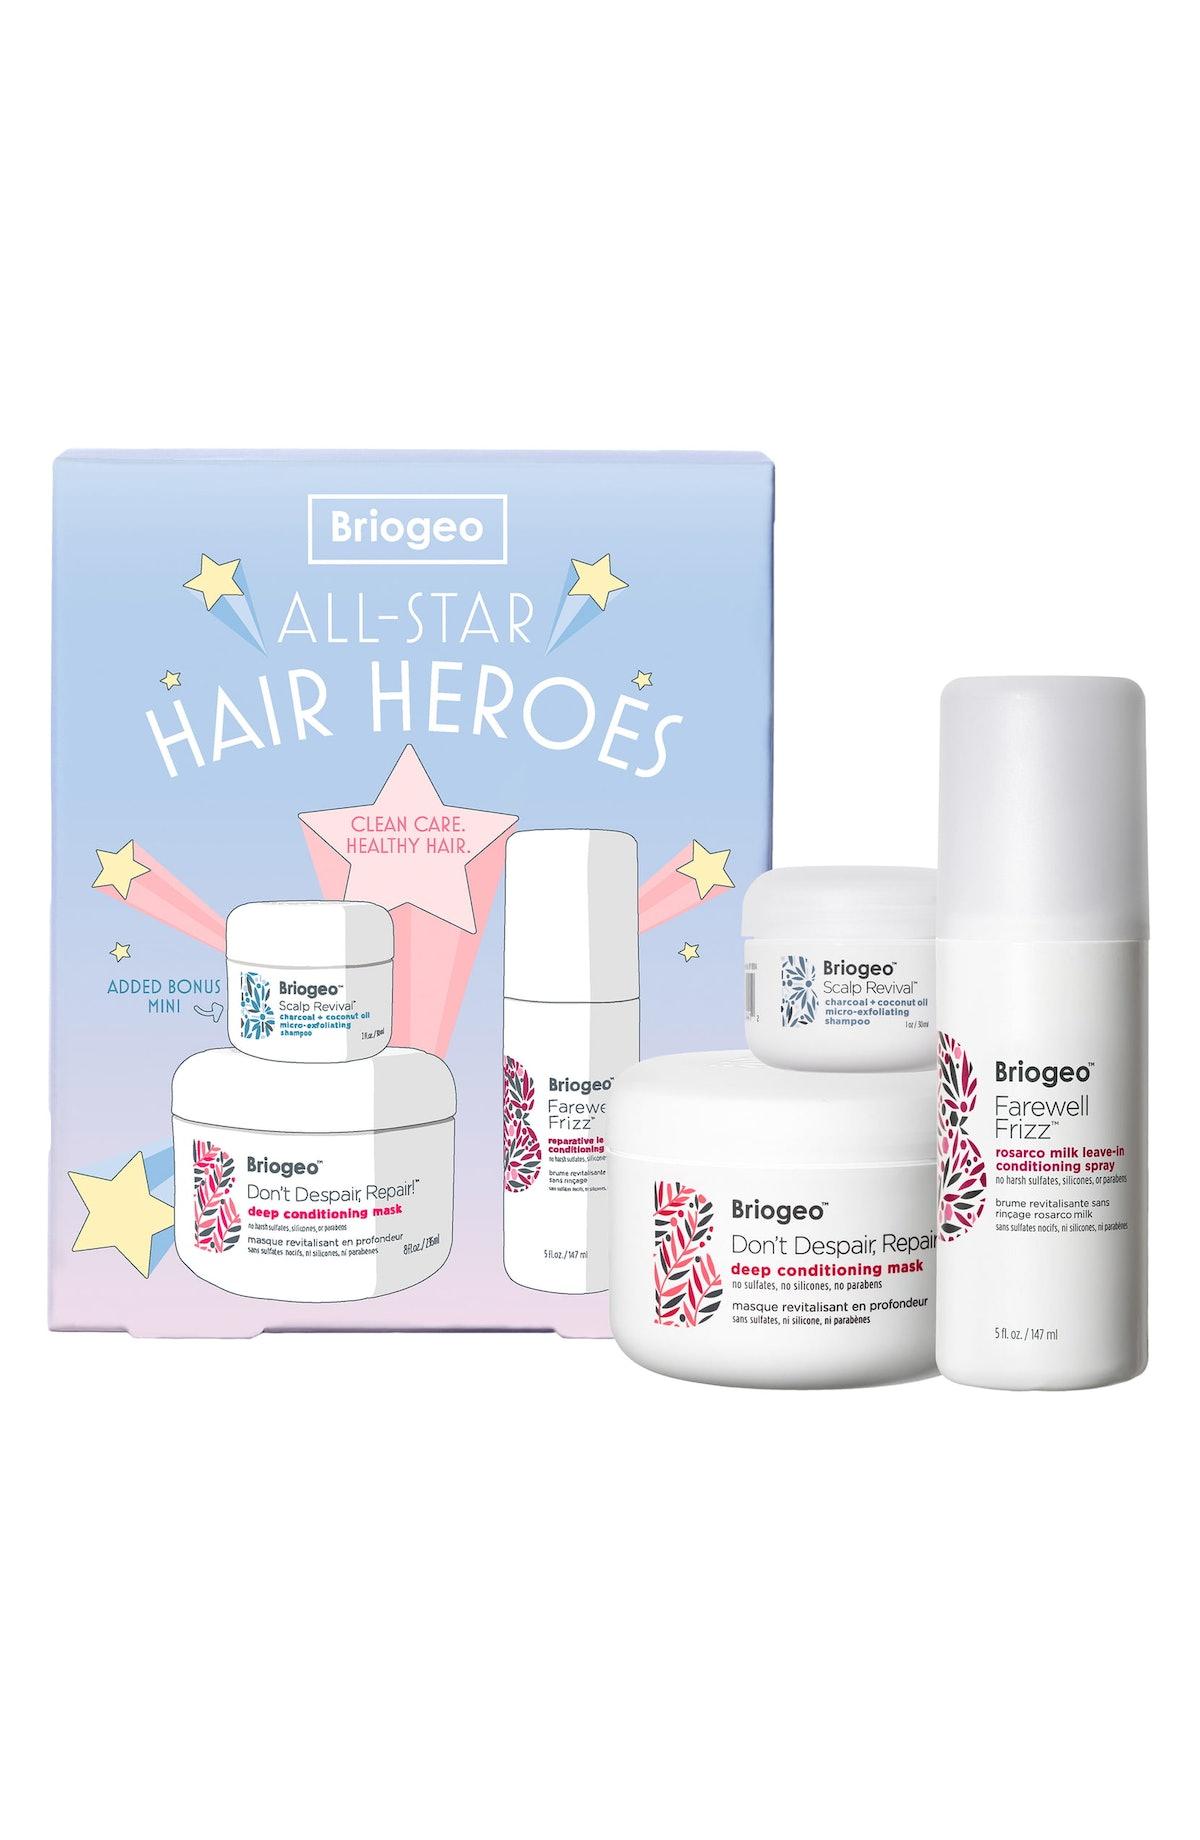 Briogeo All-Star Hair Heroes Set